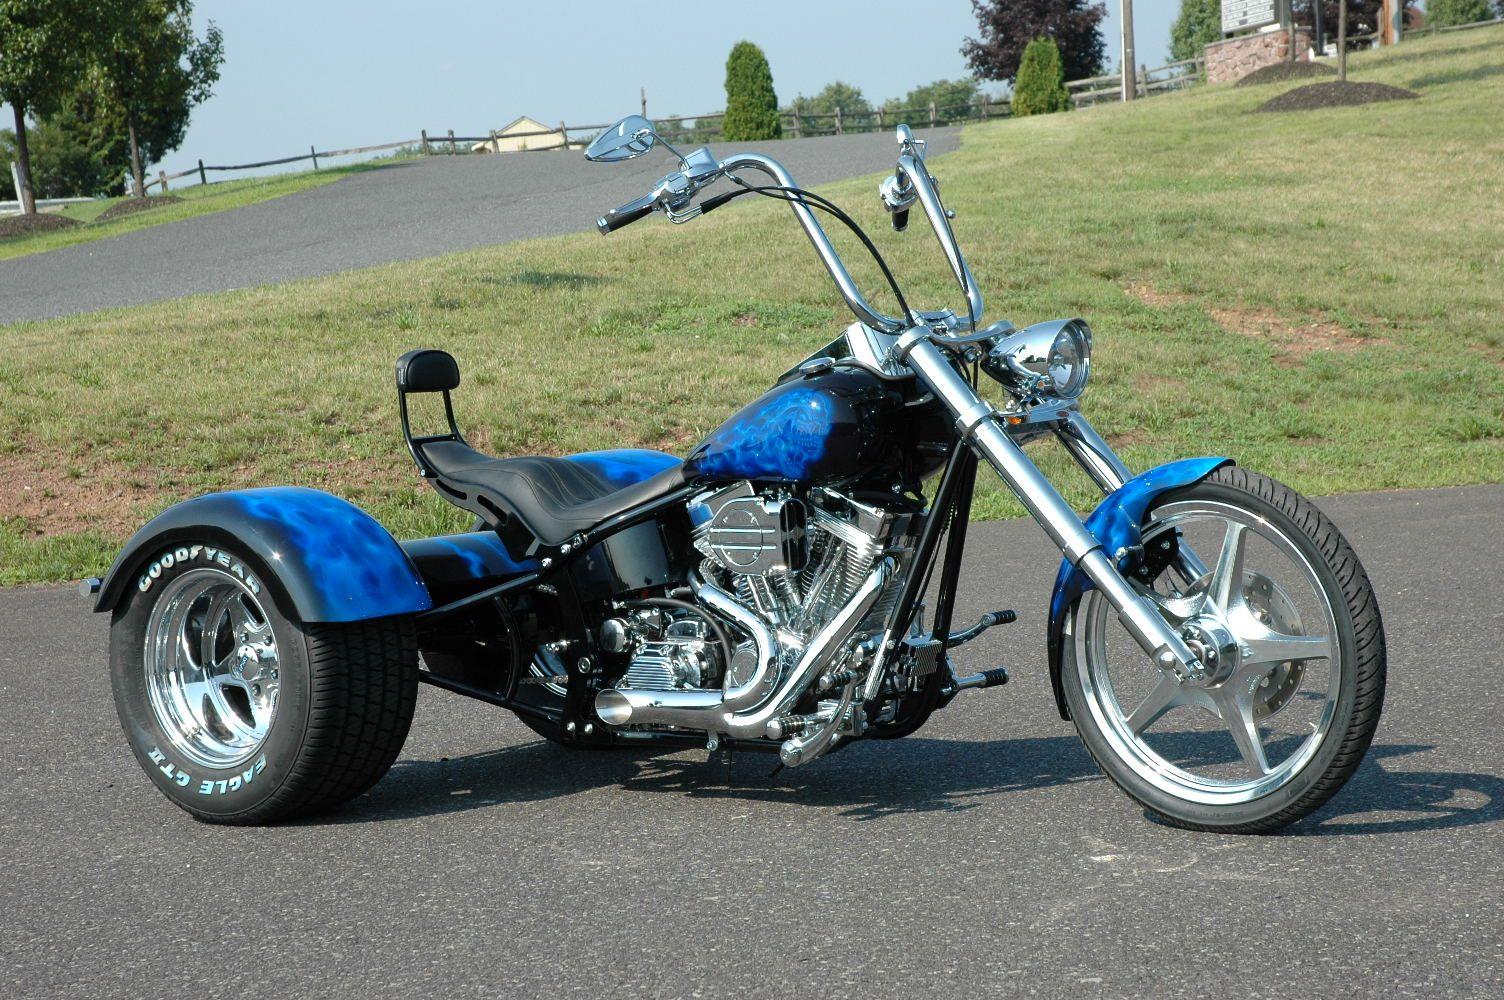 Custom harley davidson motorcycles motorcycle trikes picture 2007 rewaco custom harley davidson chopper